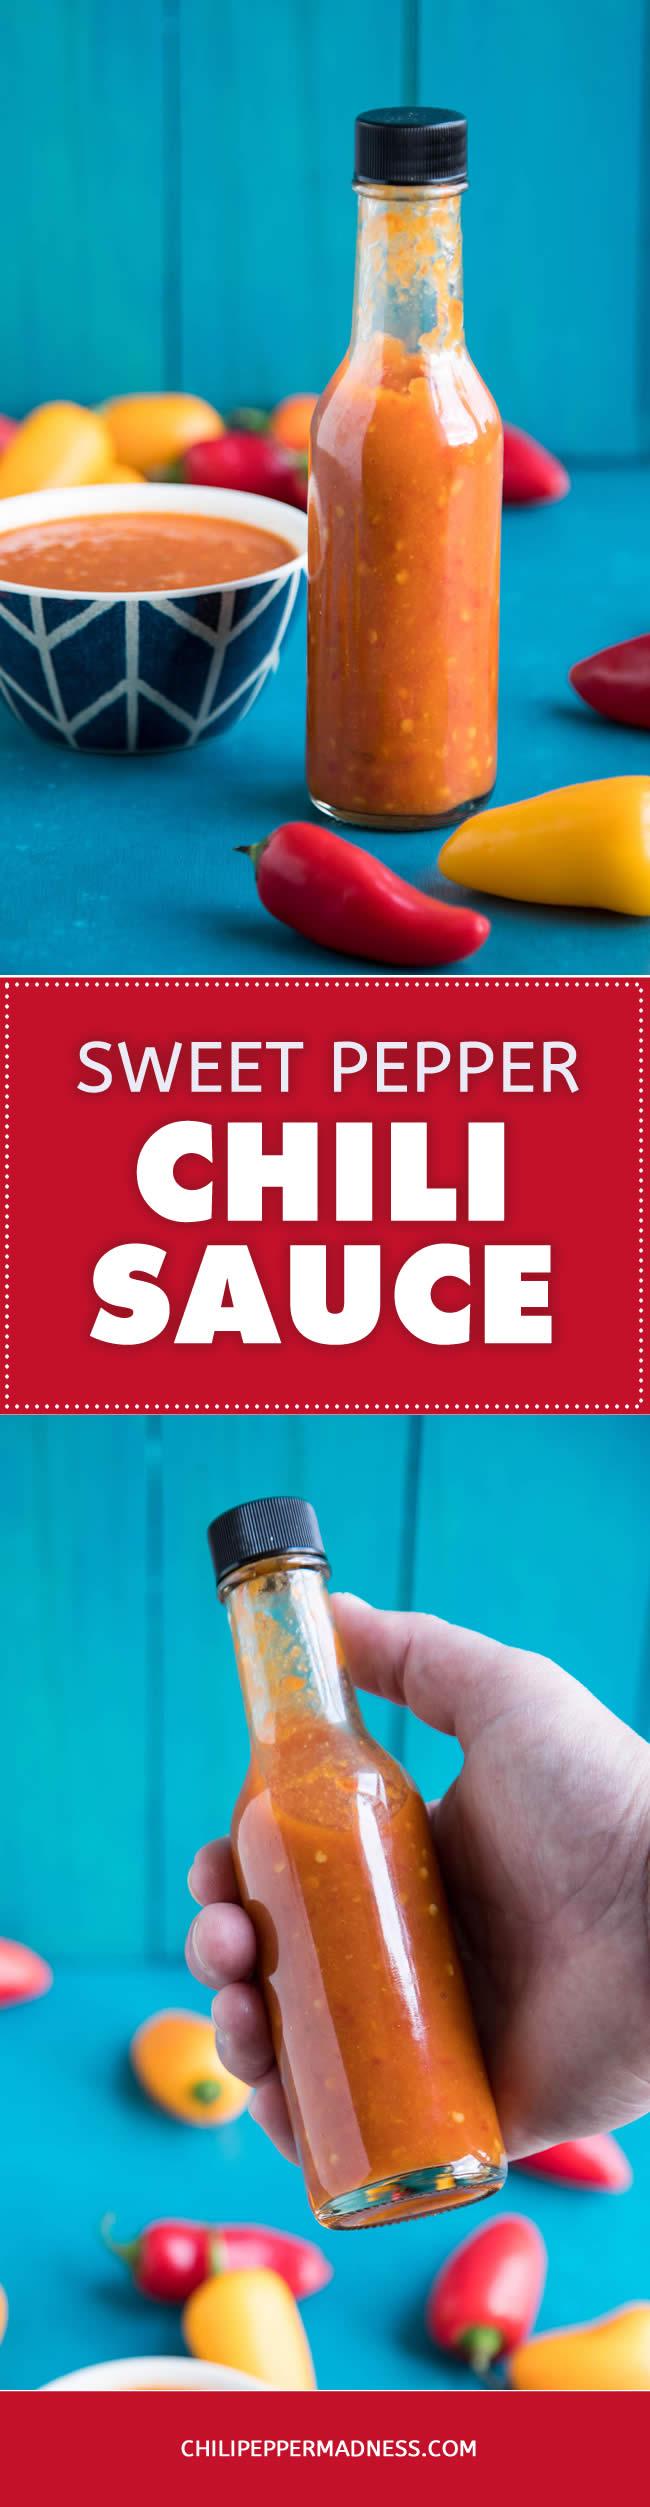 Sweet Pepper Chili Sauce - Recipe